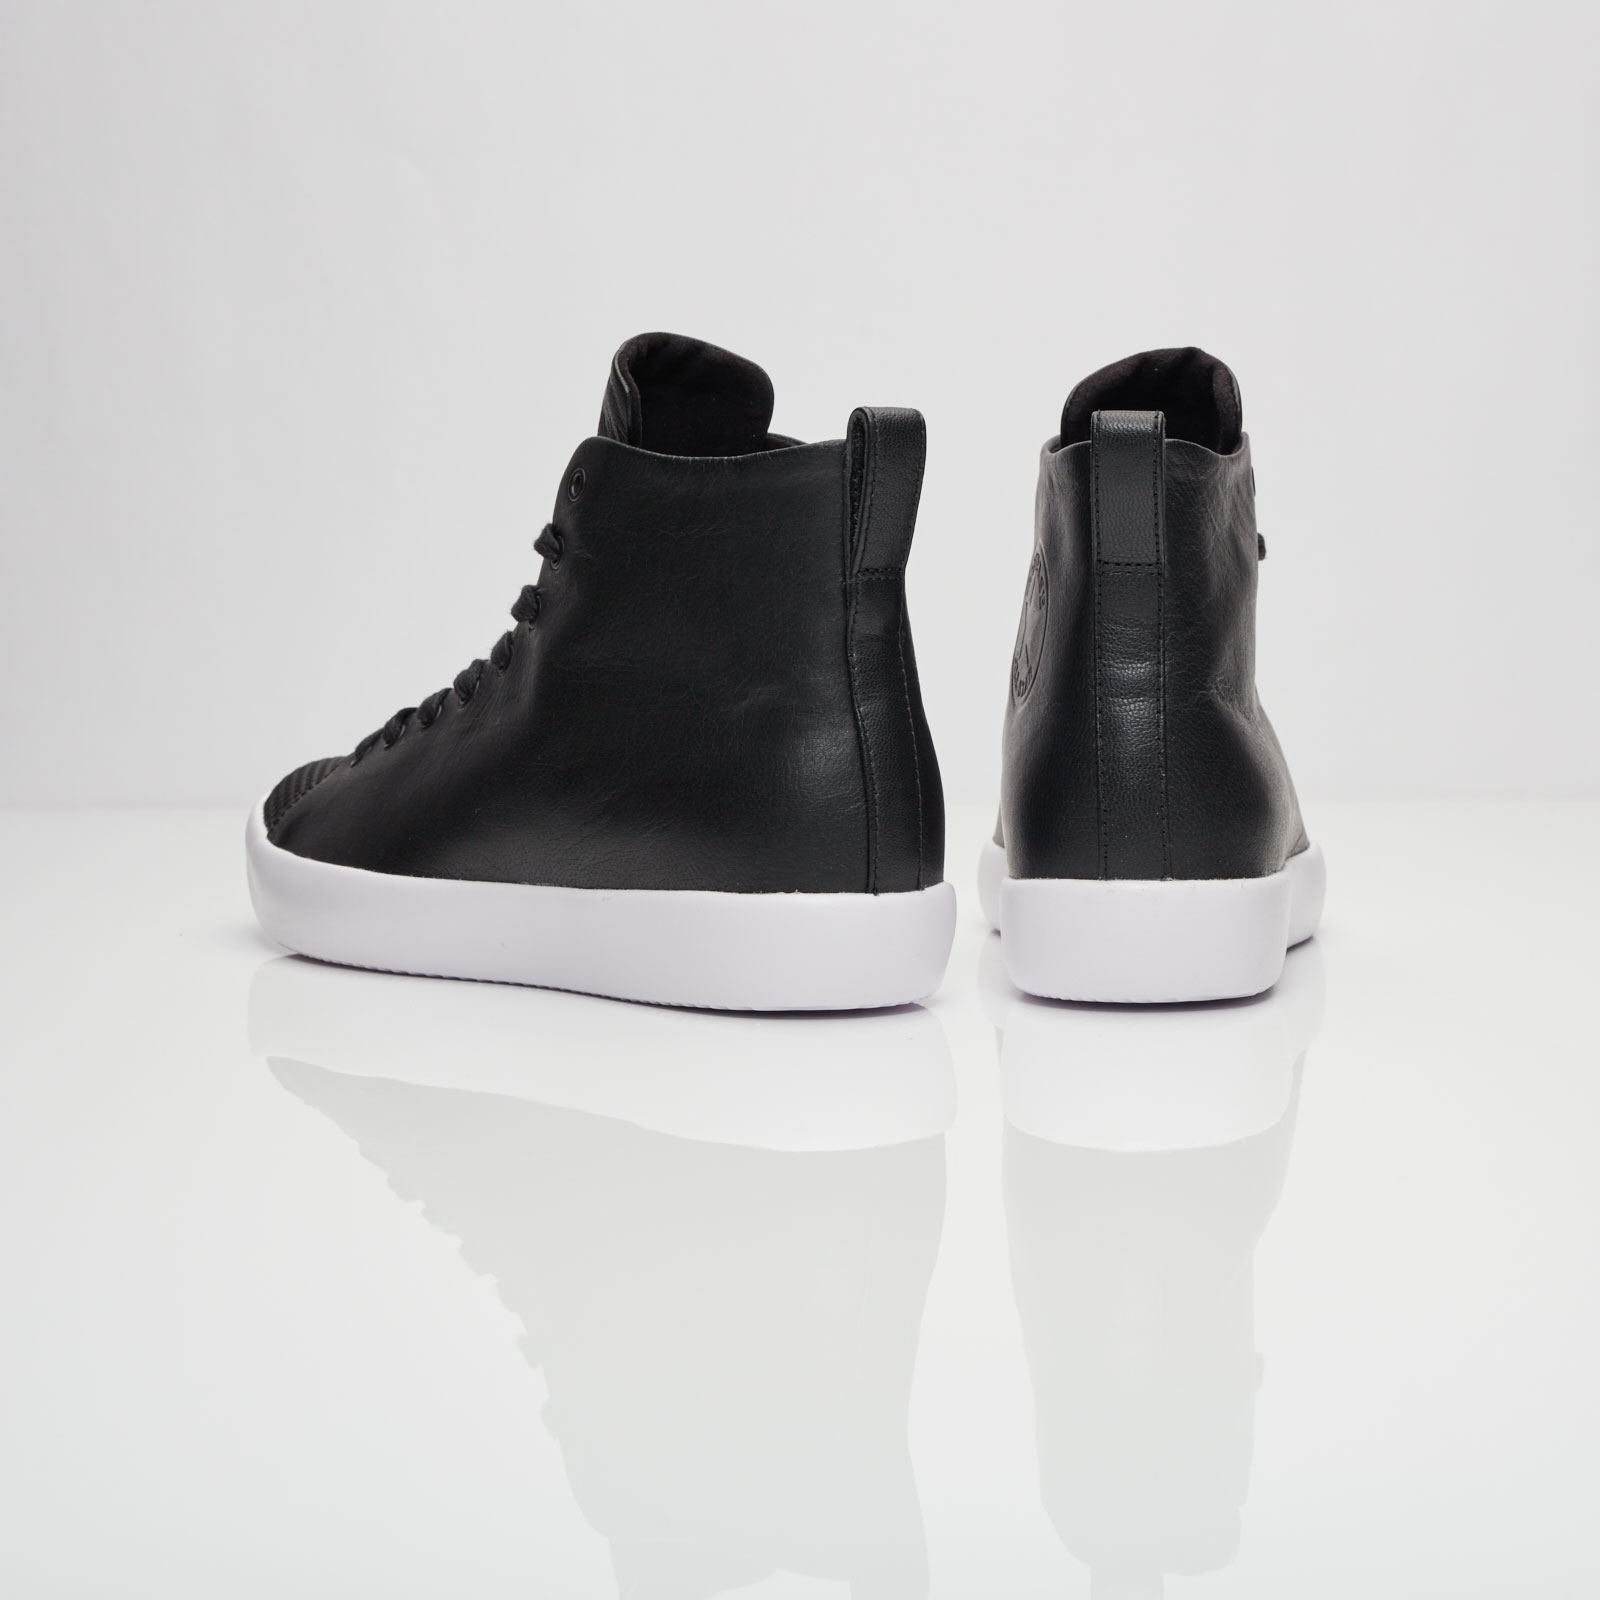 ba1b3d93a08c Converse All Star Modern Hi - 155022c - Sneakersnstuff